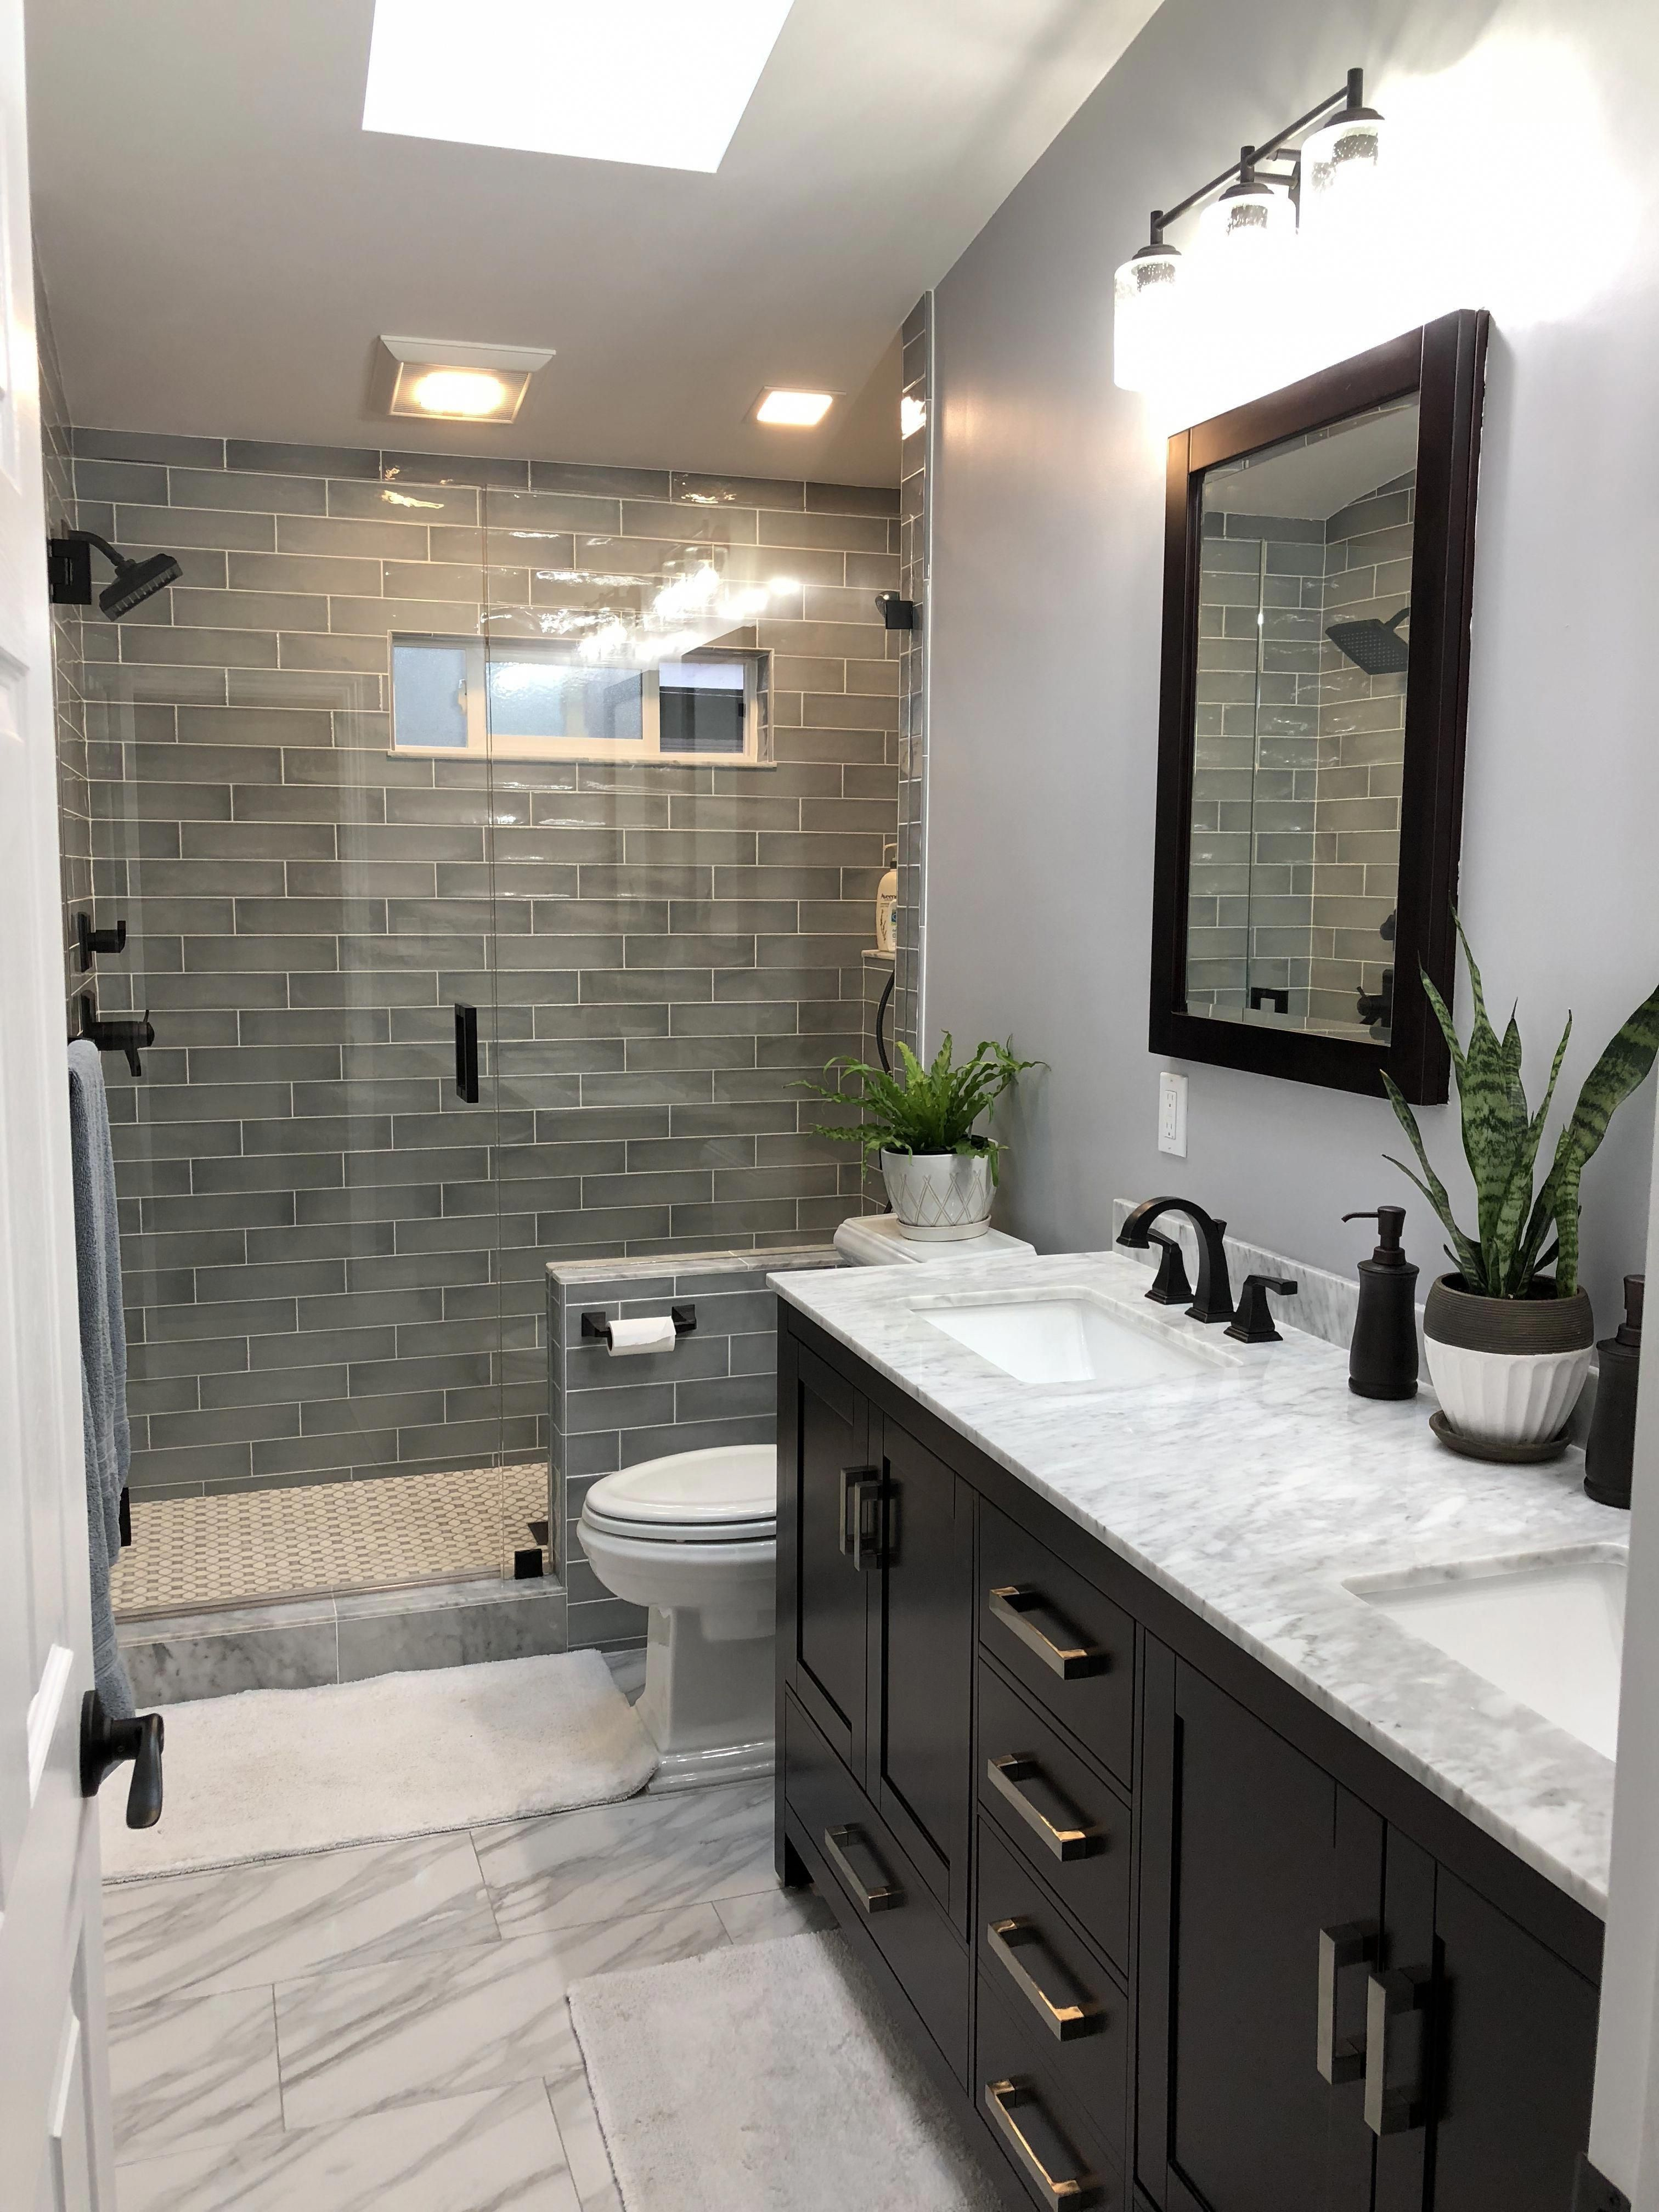 21 Bathroom Remodel Ideas [The Latest Modern Design ...